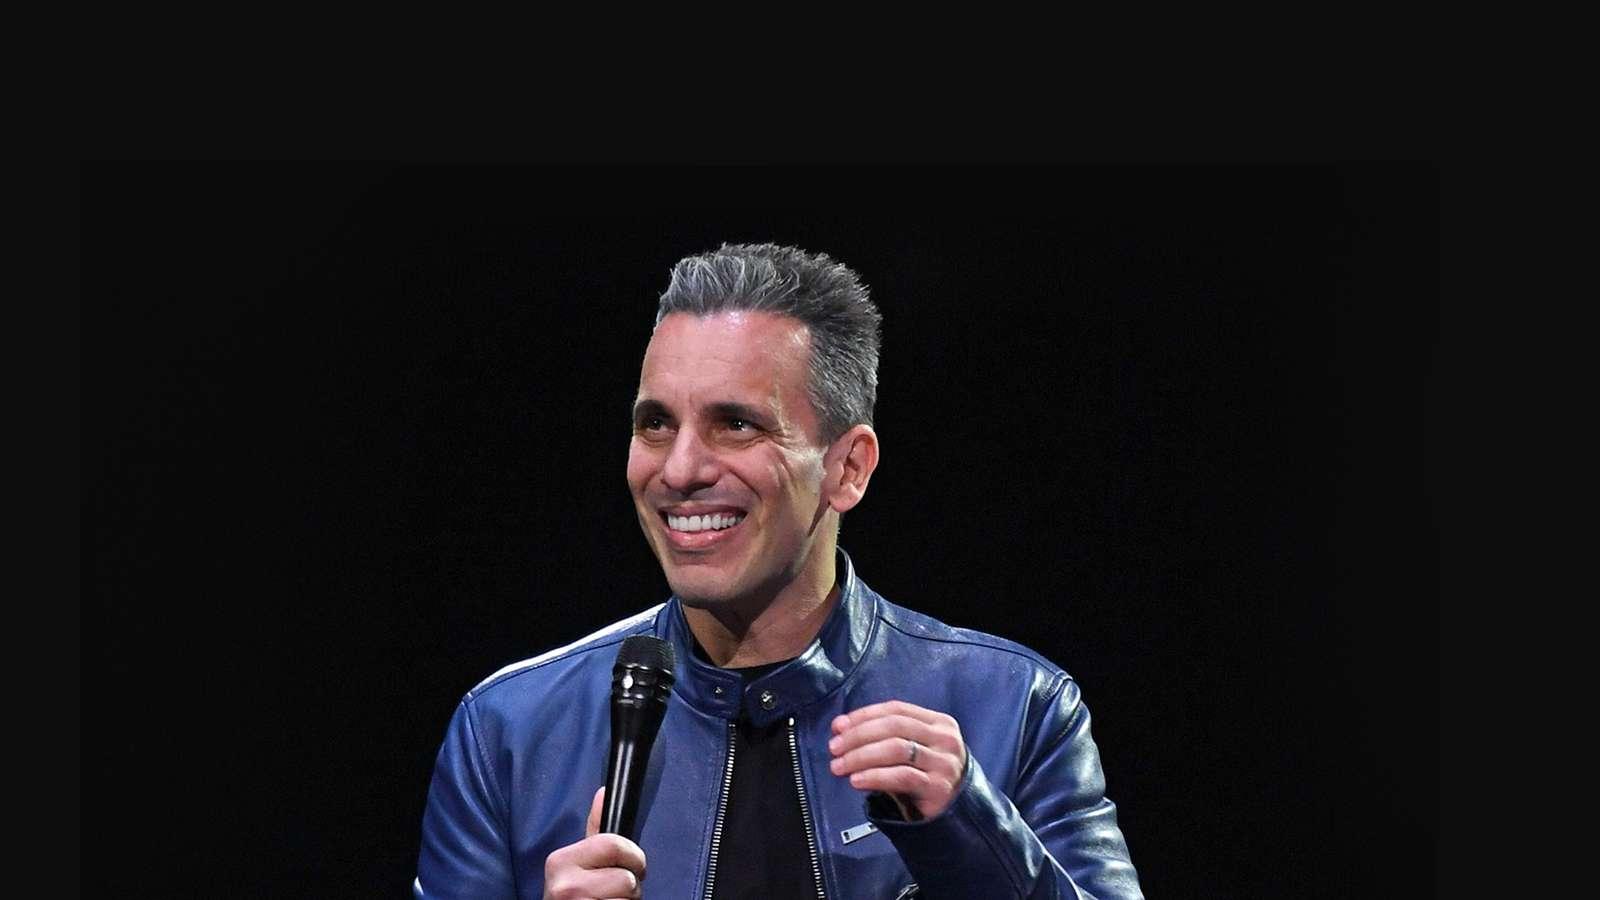 Sebastian Maniscalco (Rescheduled from 3/15/2020, 7/26/2020, 4/25/2021)